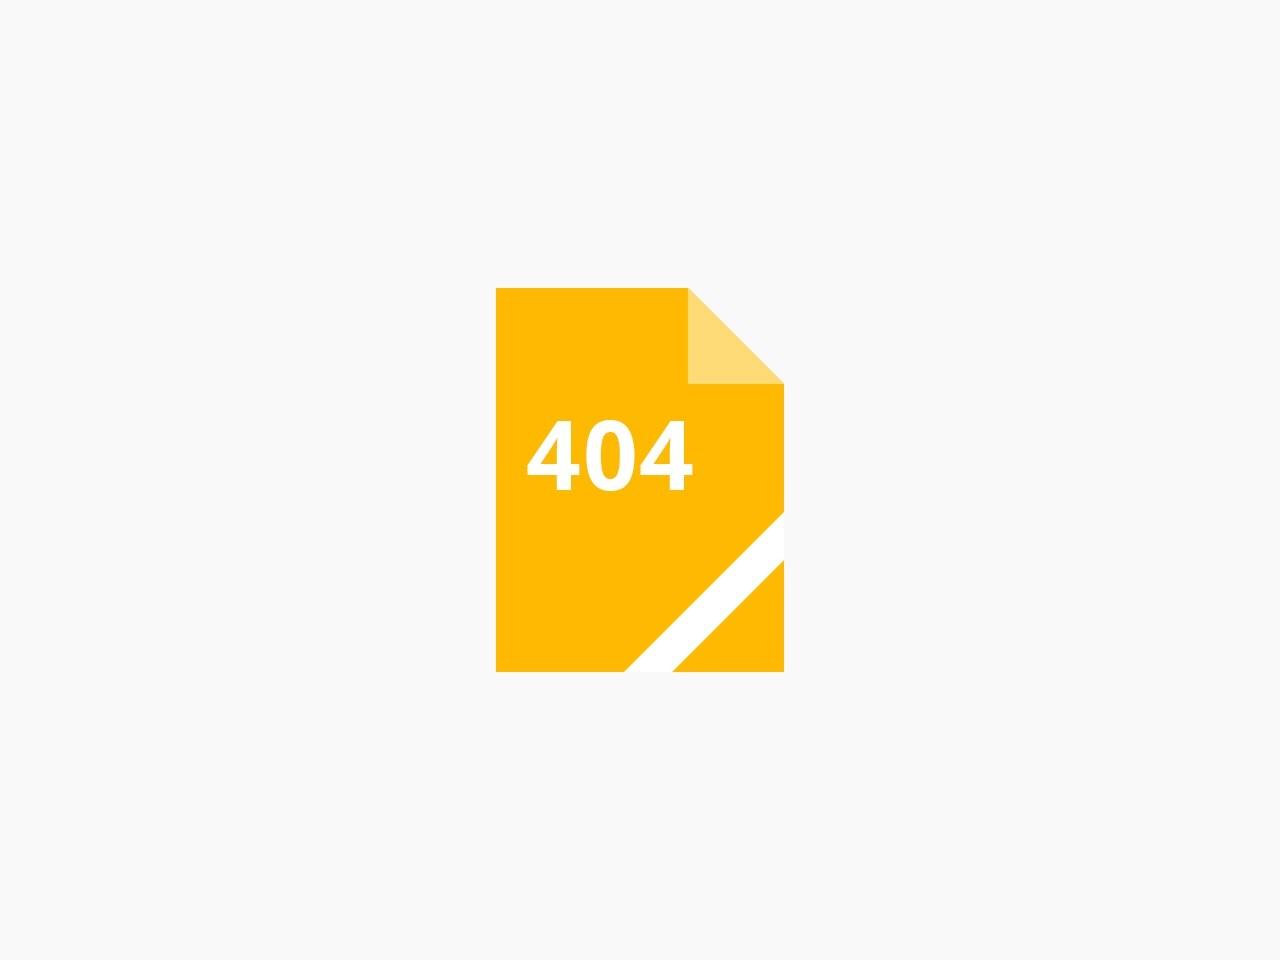 http://vector-kaitori.jp/brand/item/ugg-australia.html